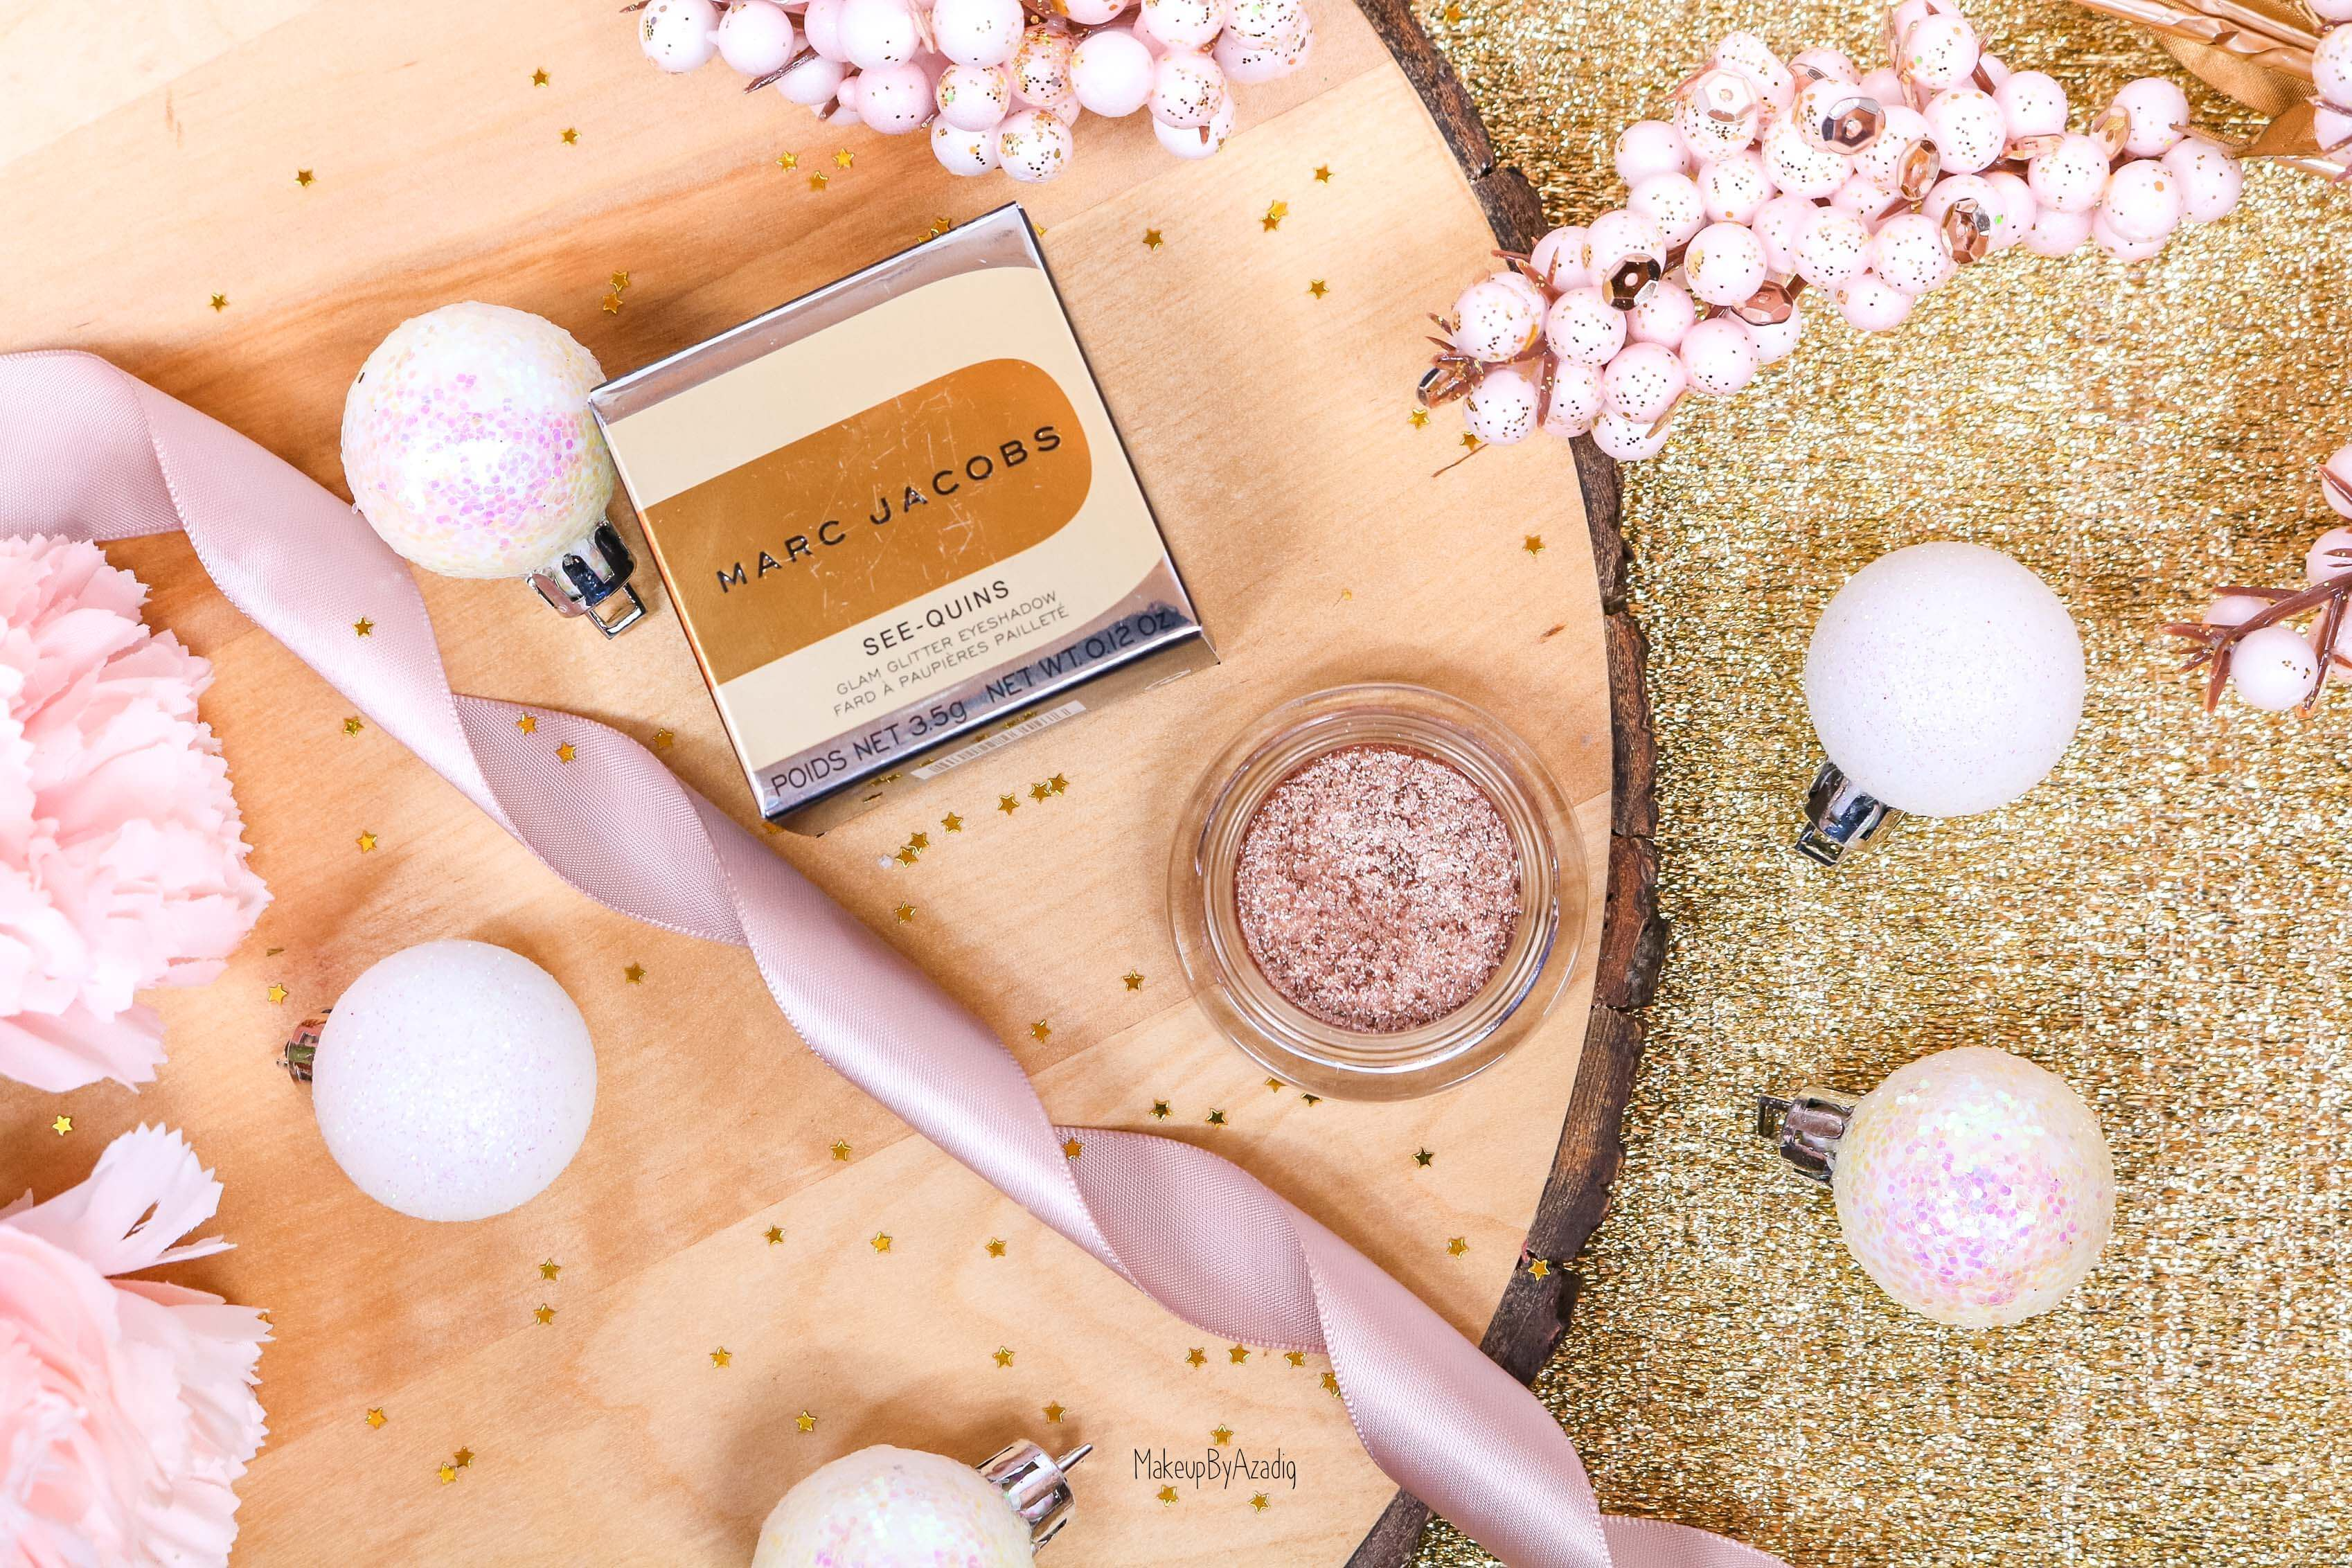 revue-fard-paupieres-paillete-marc-jacobs-beauty-gleam-girl-makeupbyazadig-avis-prix-swatch-miniature